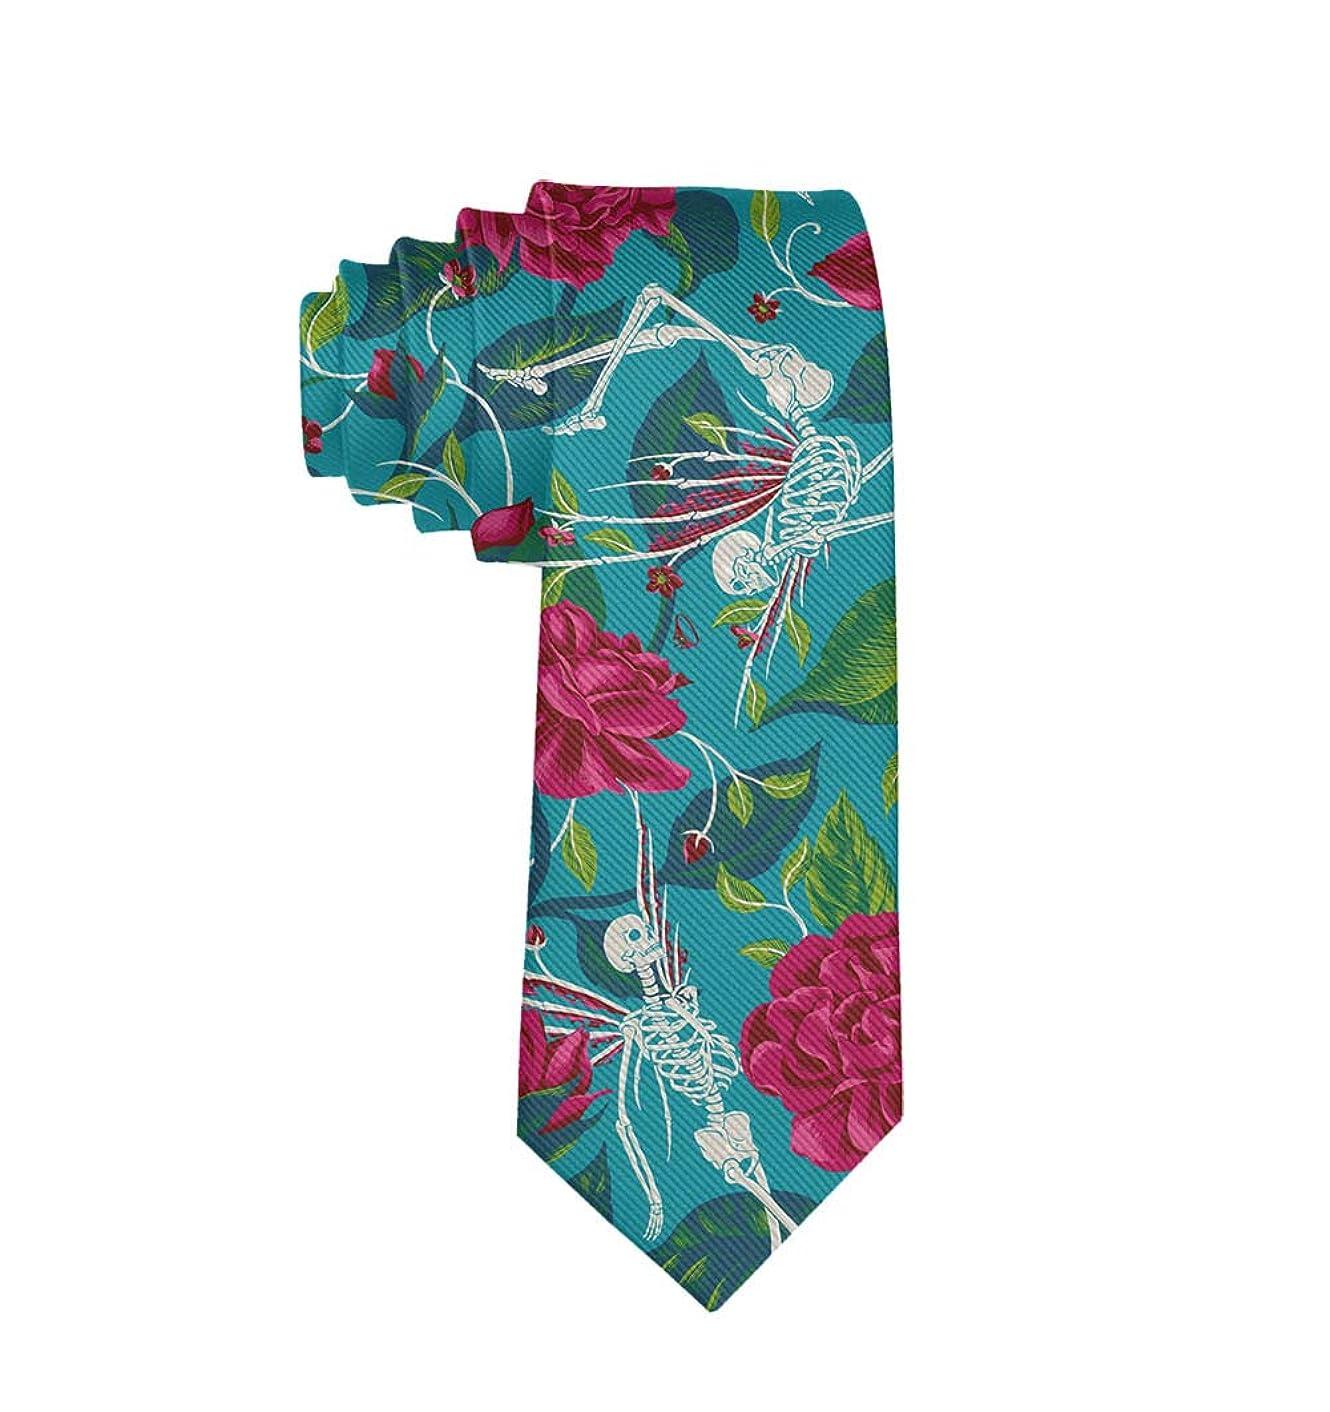 MrDecor Men's Skinny Tie Skeleton Skull Fashion Causal Floral Printed Silk Necktie